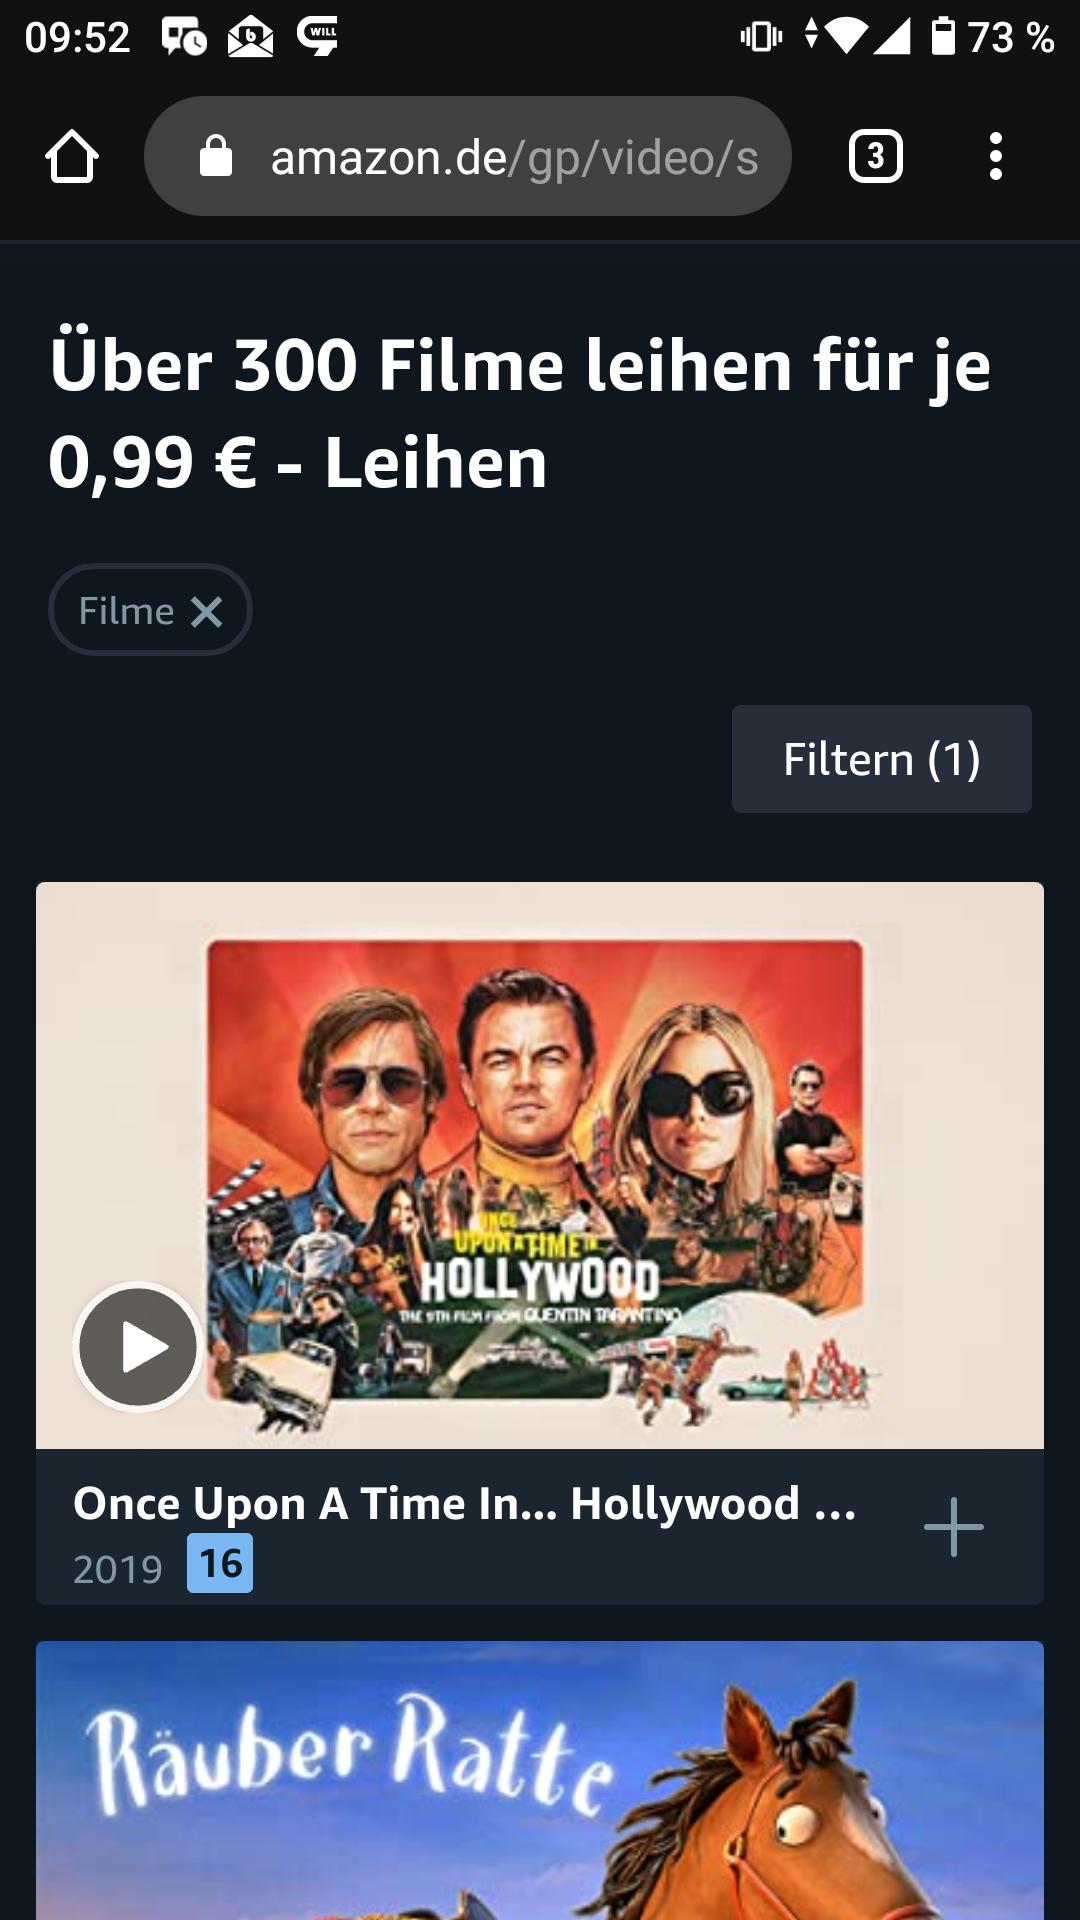 Prime Video: Über 300 Filme um 0,99€ leihen